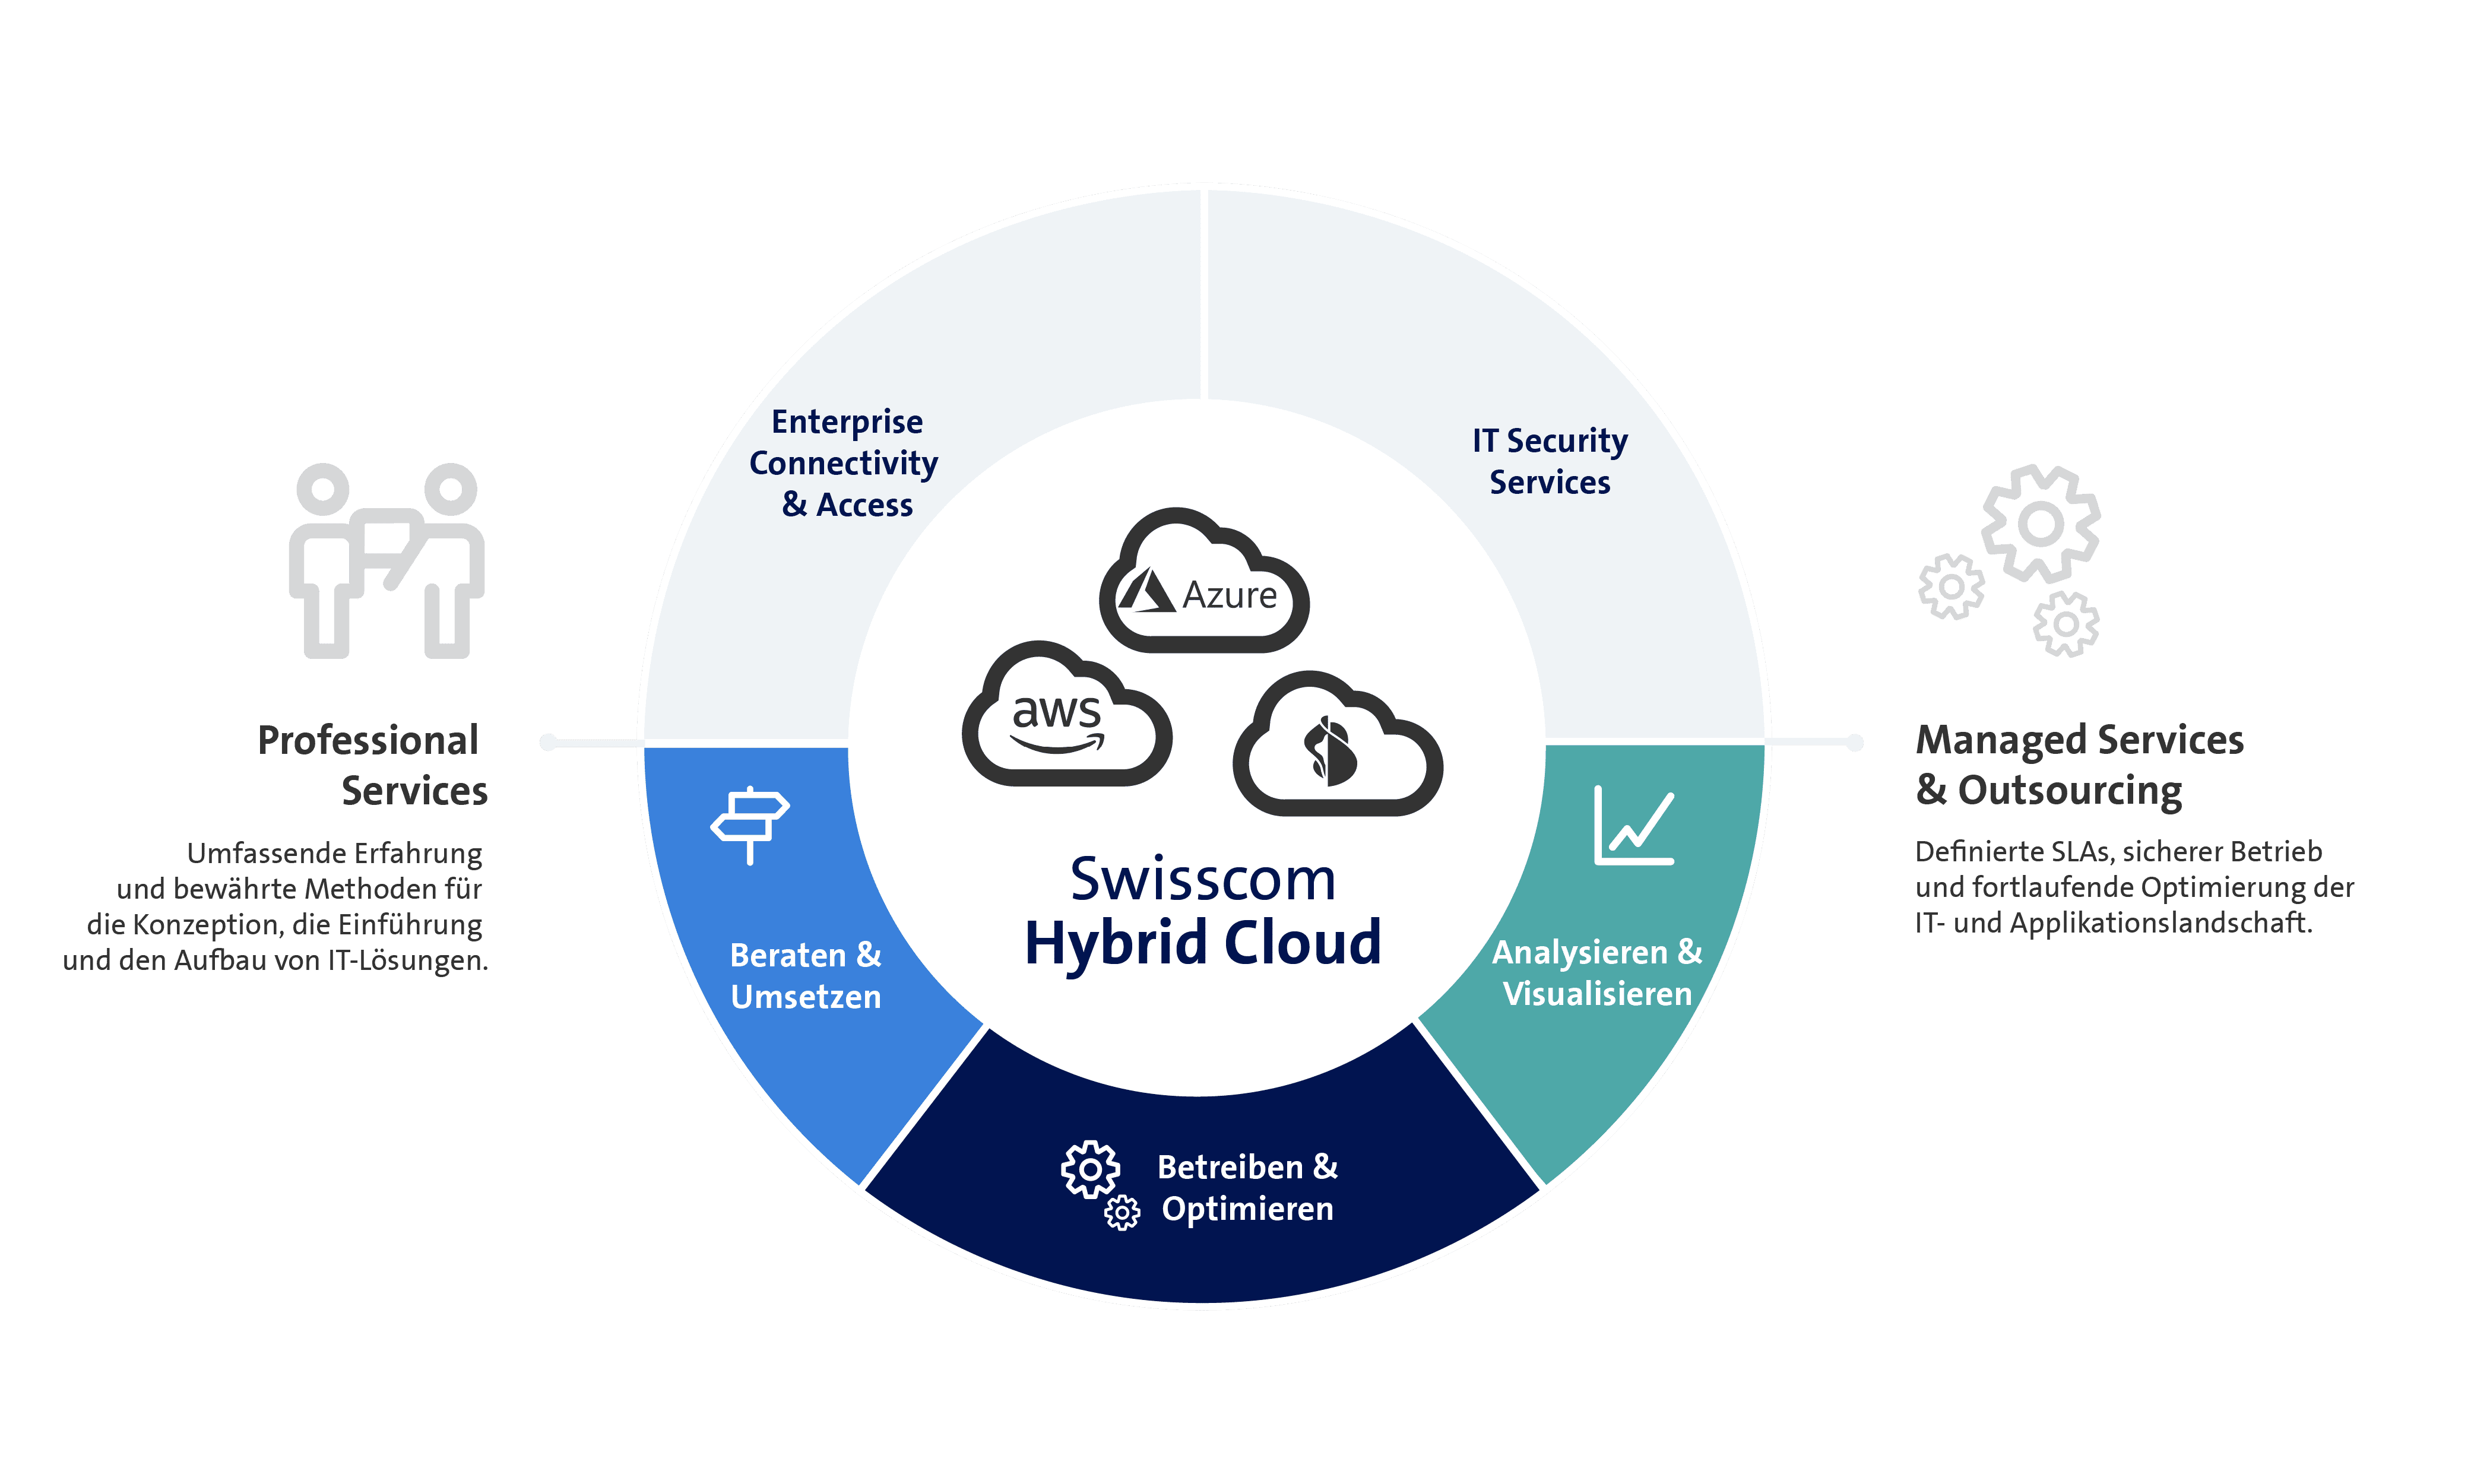 Swisscom Hybrid Cloud